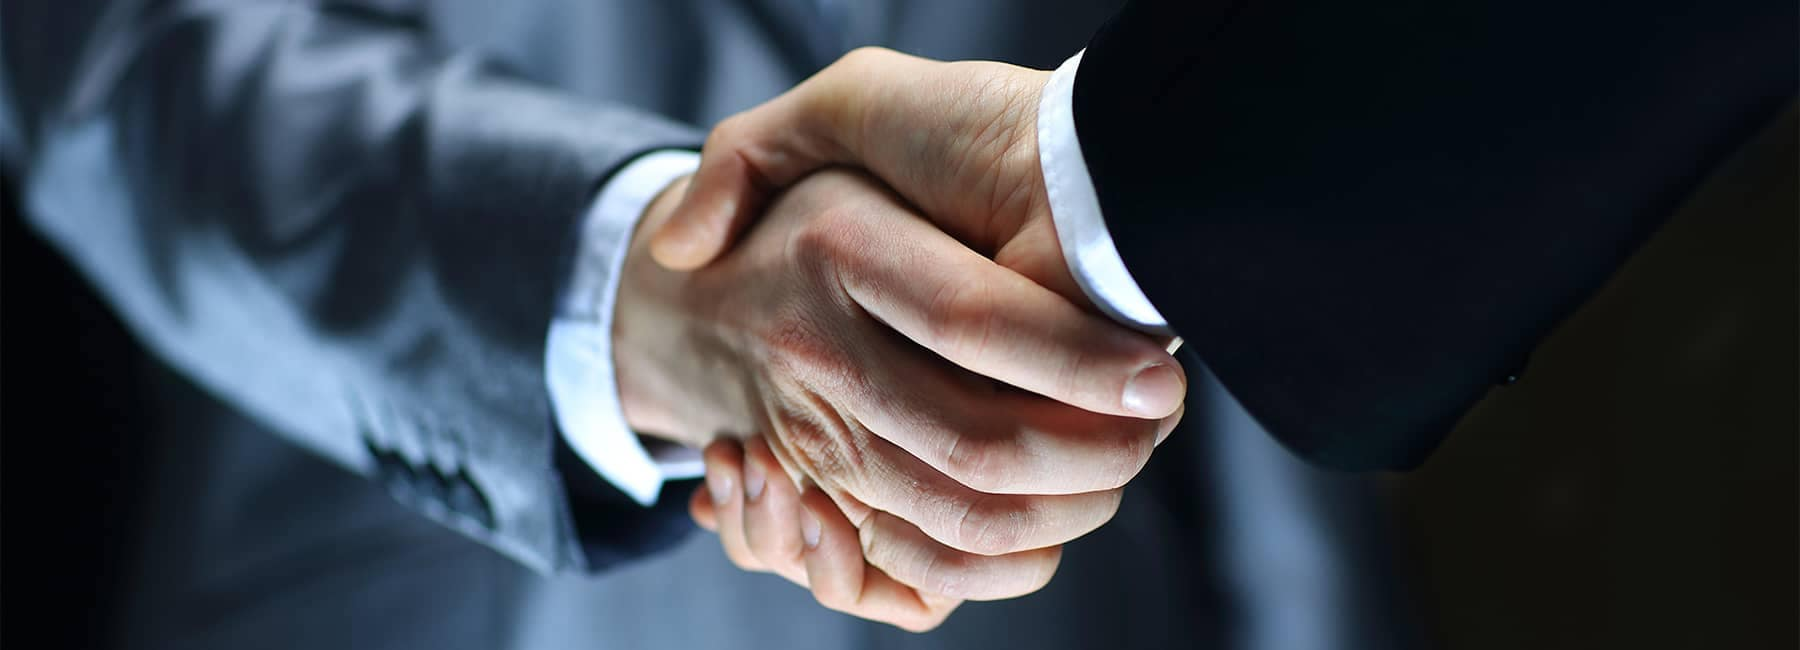 Businessmen in Suits Shaking Hands